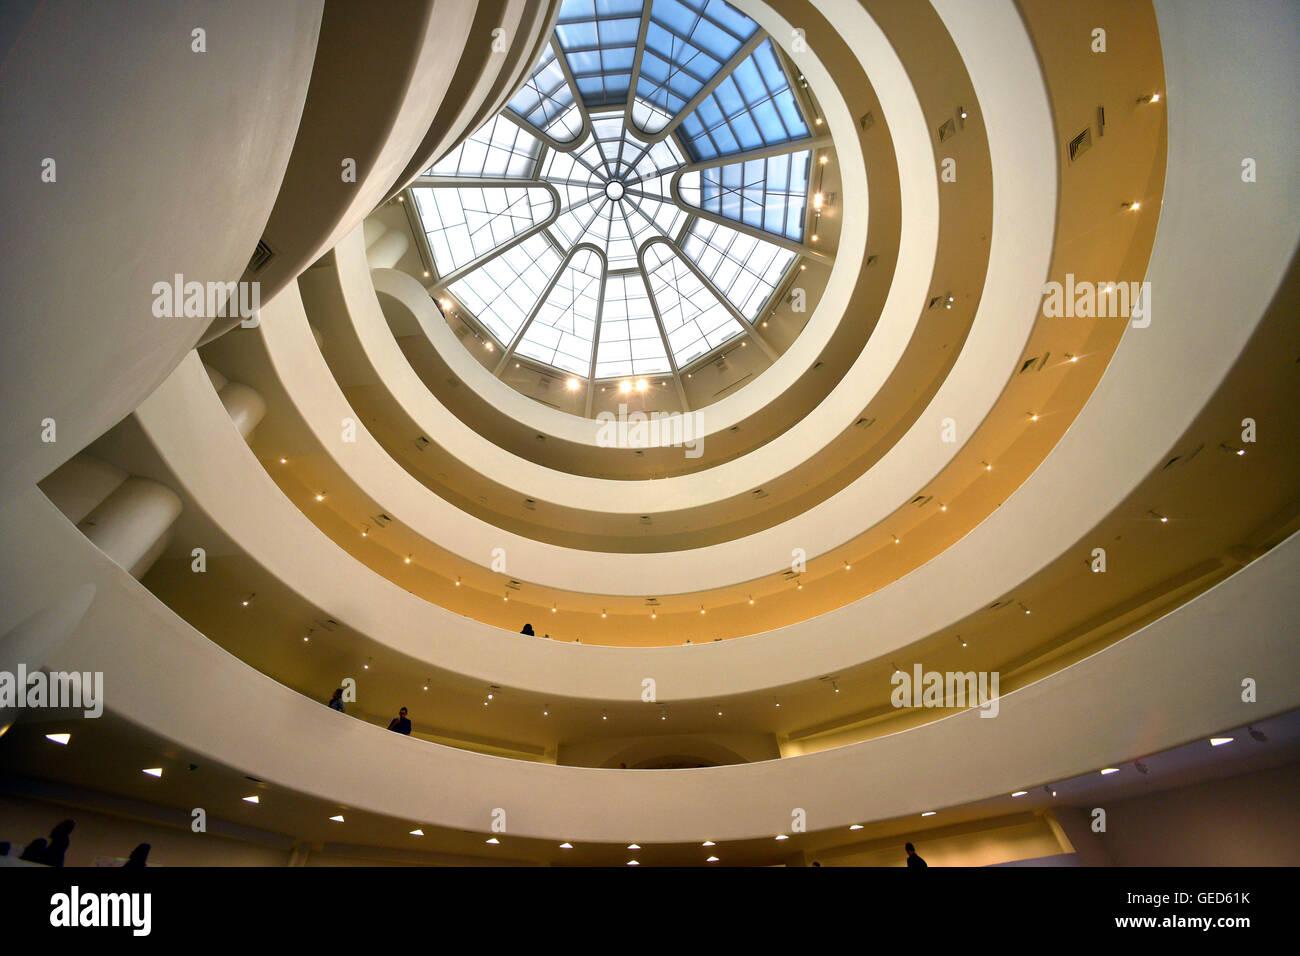 Innenraum des Guggenheim Museums, New York Stockbild